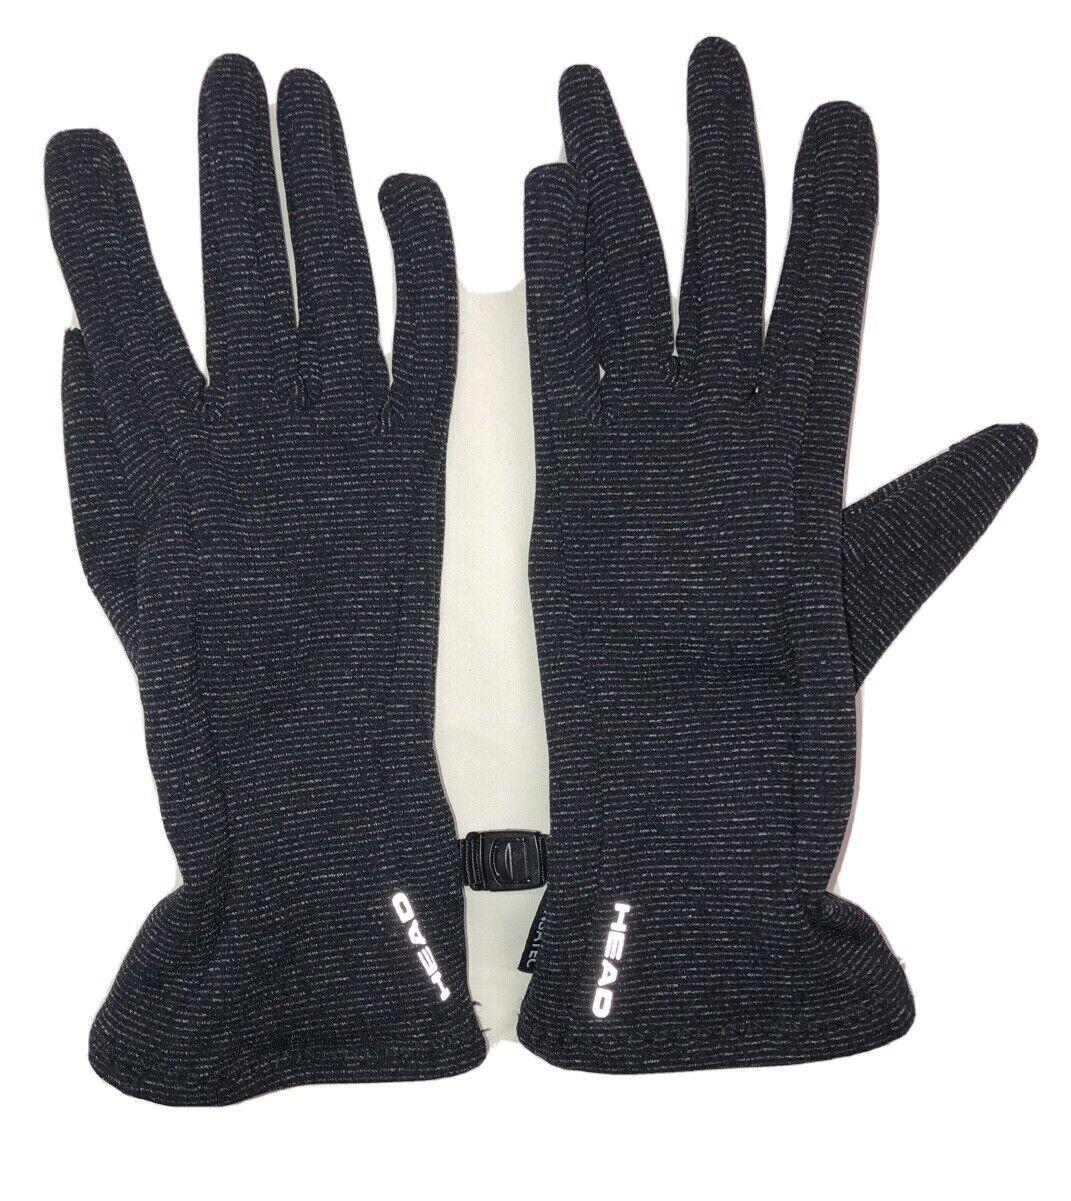 Head Unisex Hybrid Glove, Gray/White, Size Small FREE SHIPPING!!